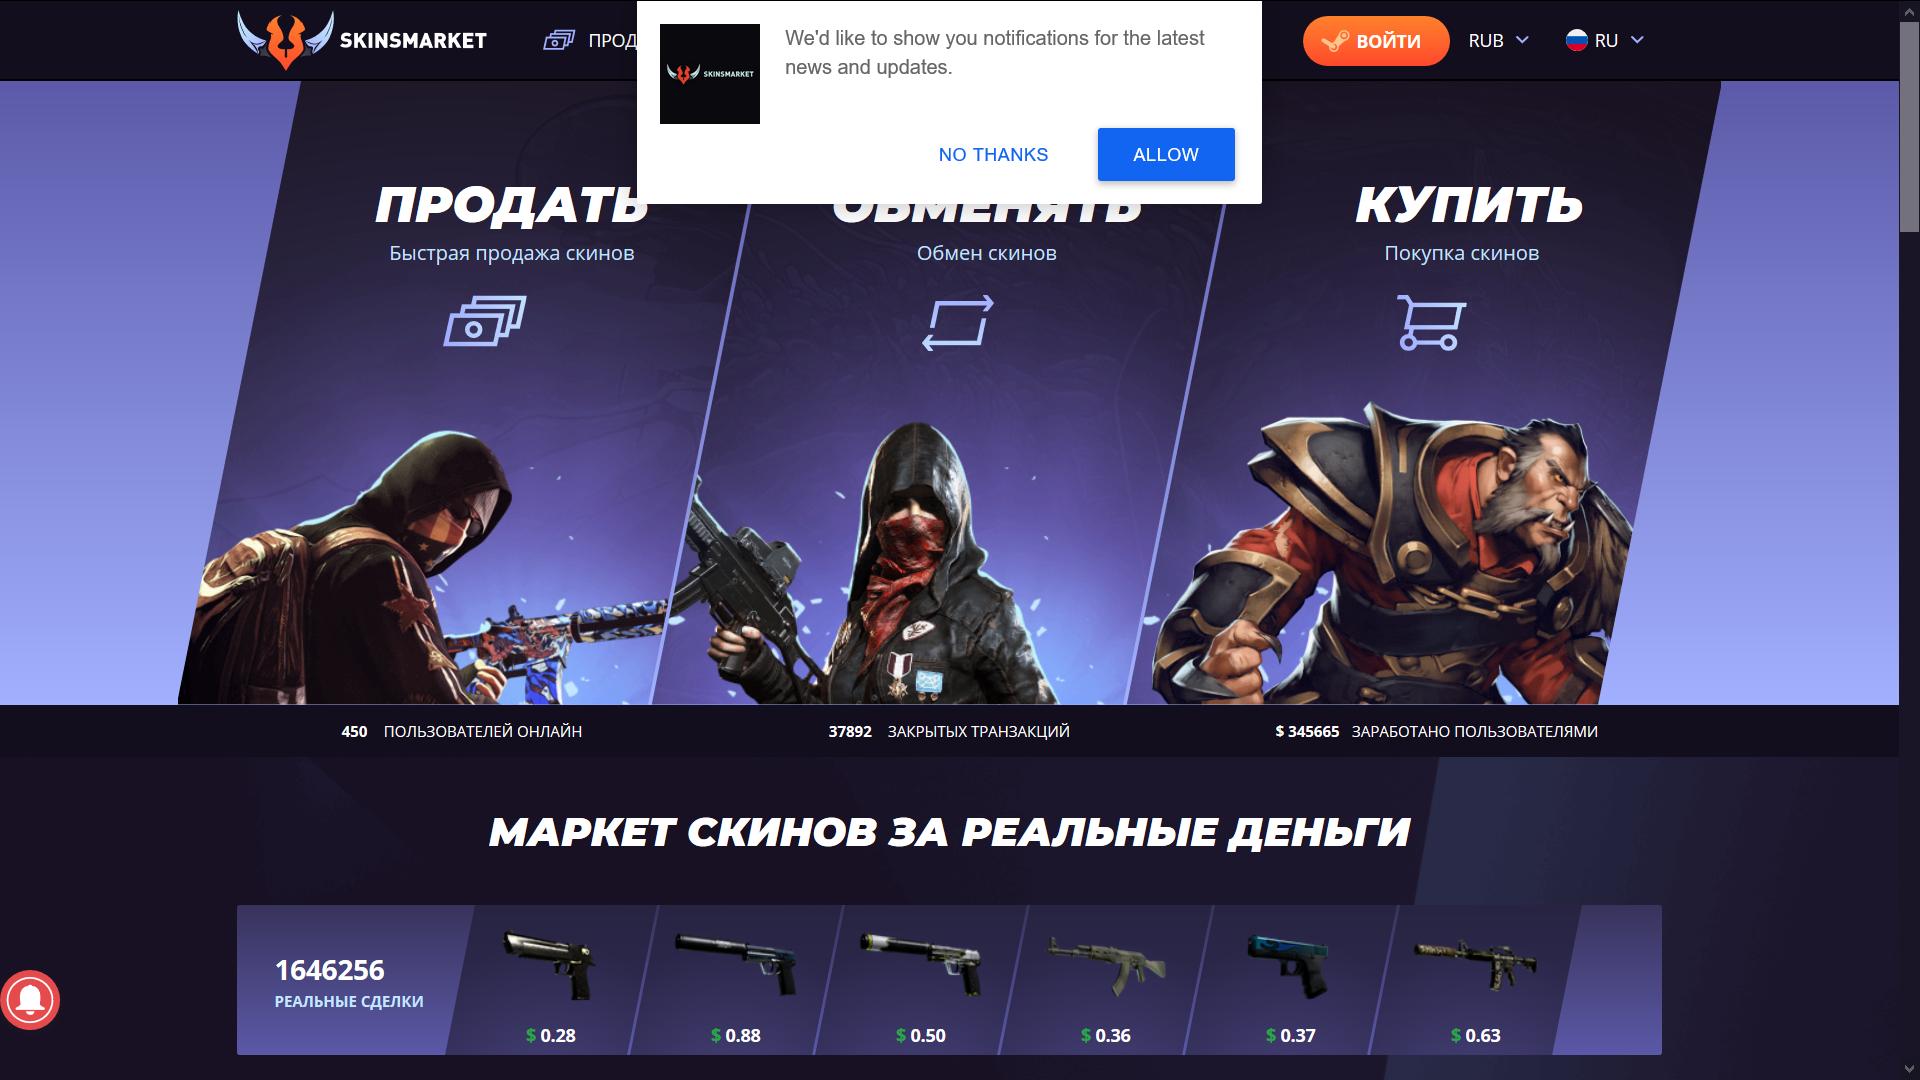 skinsmarket.com/ru мошенники